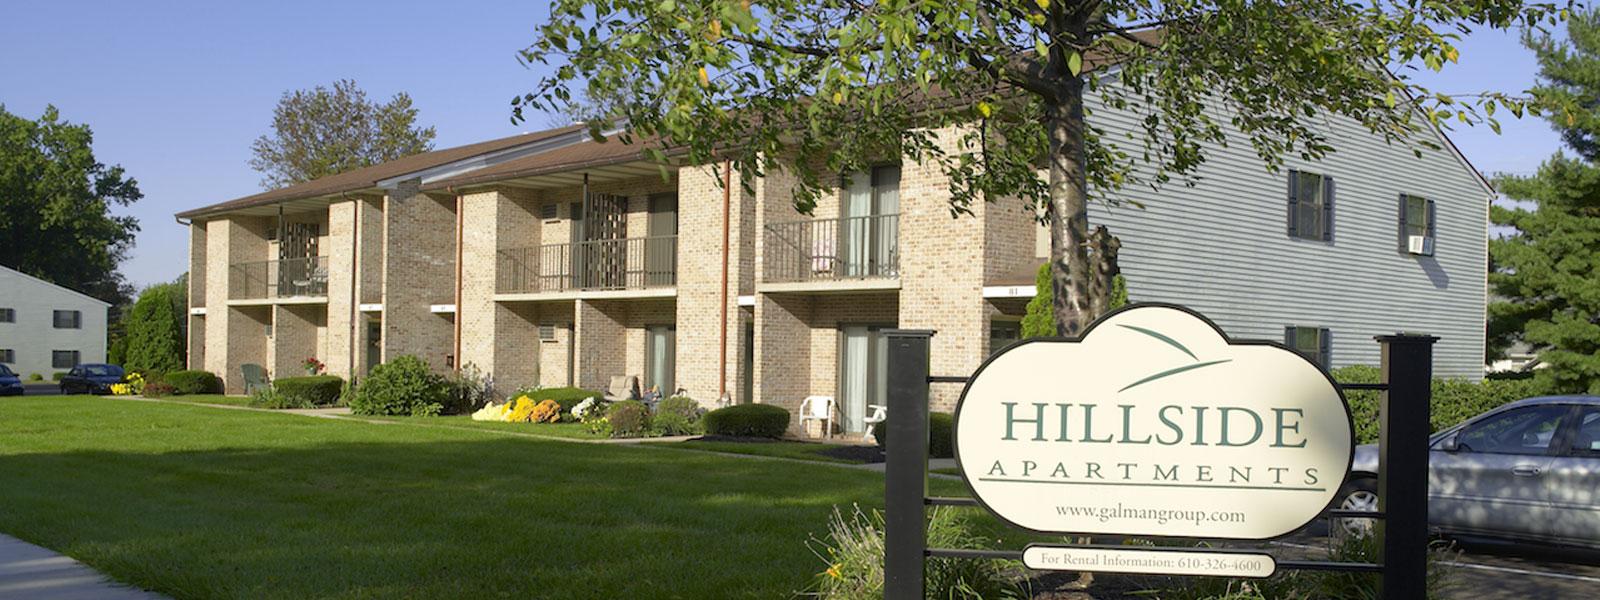 Pottstown & Stowe Apartments  Hillside Apartments  The